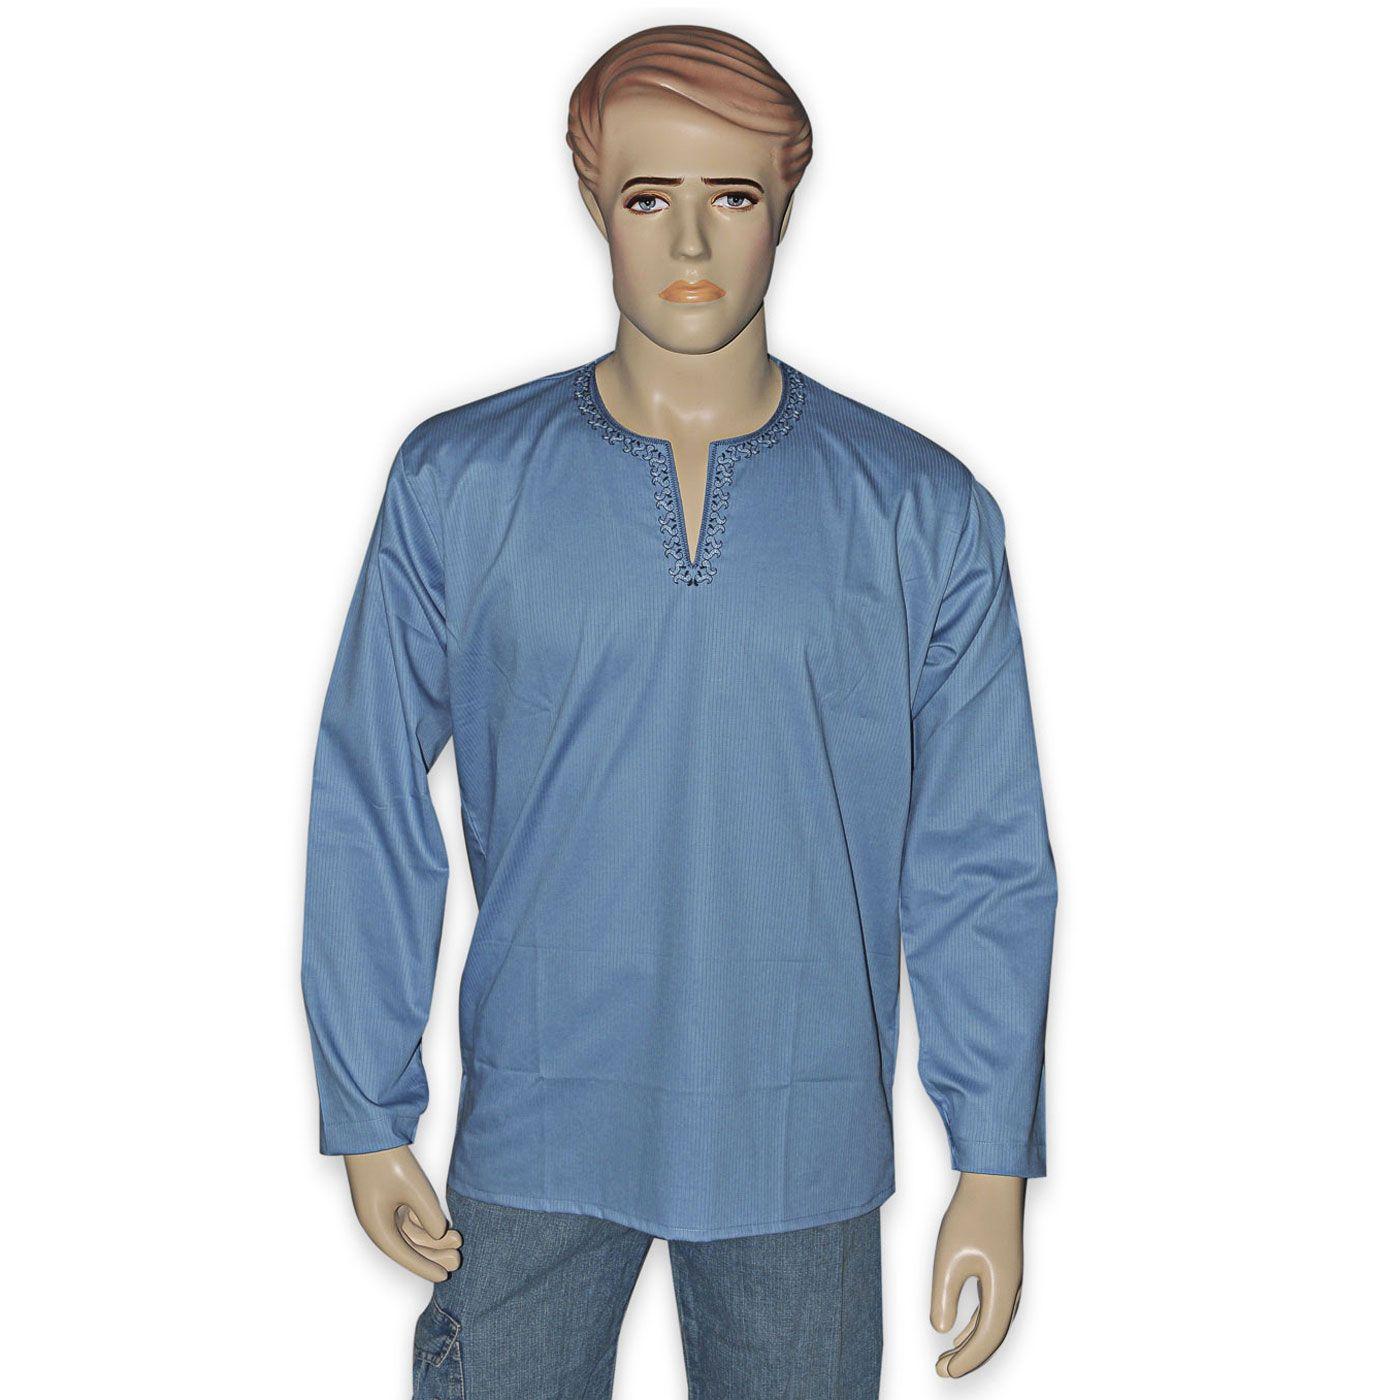 dce8f5bc short kurta patterns | Men's Fashion | Short kurta for men, Men ...